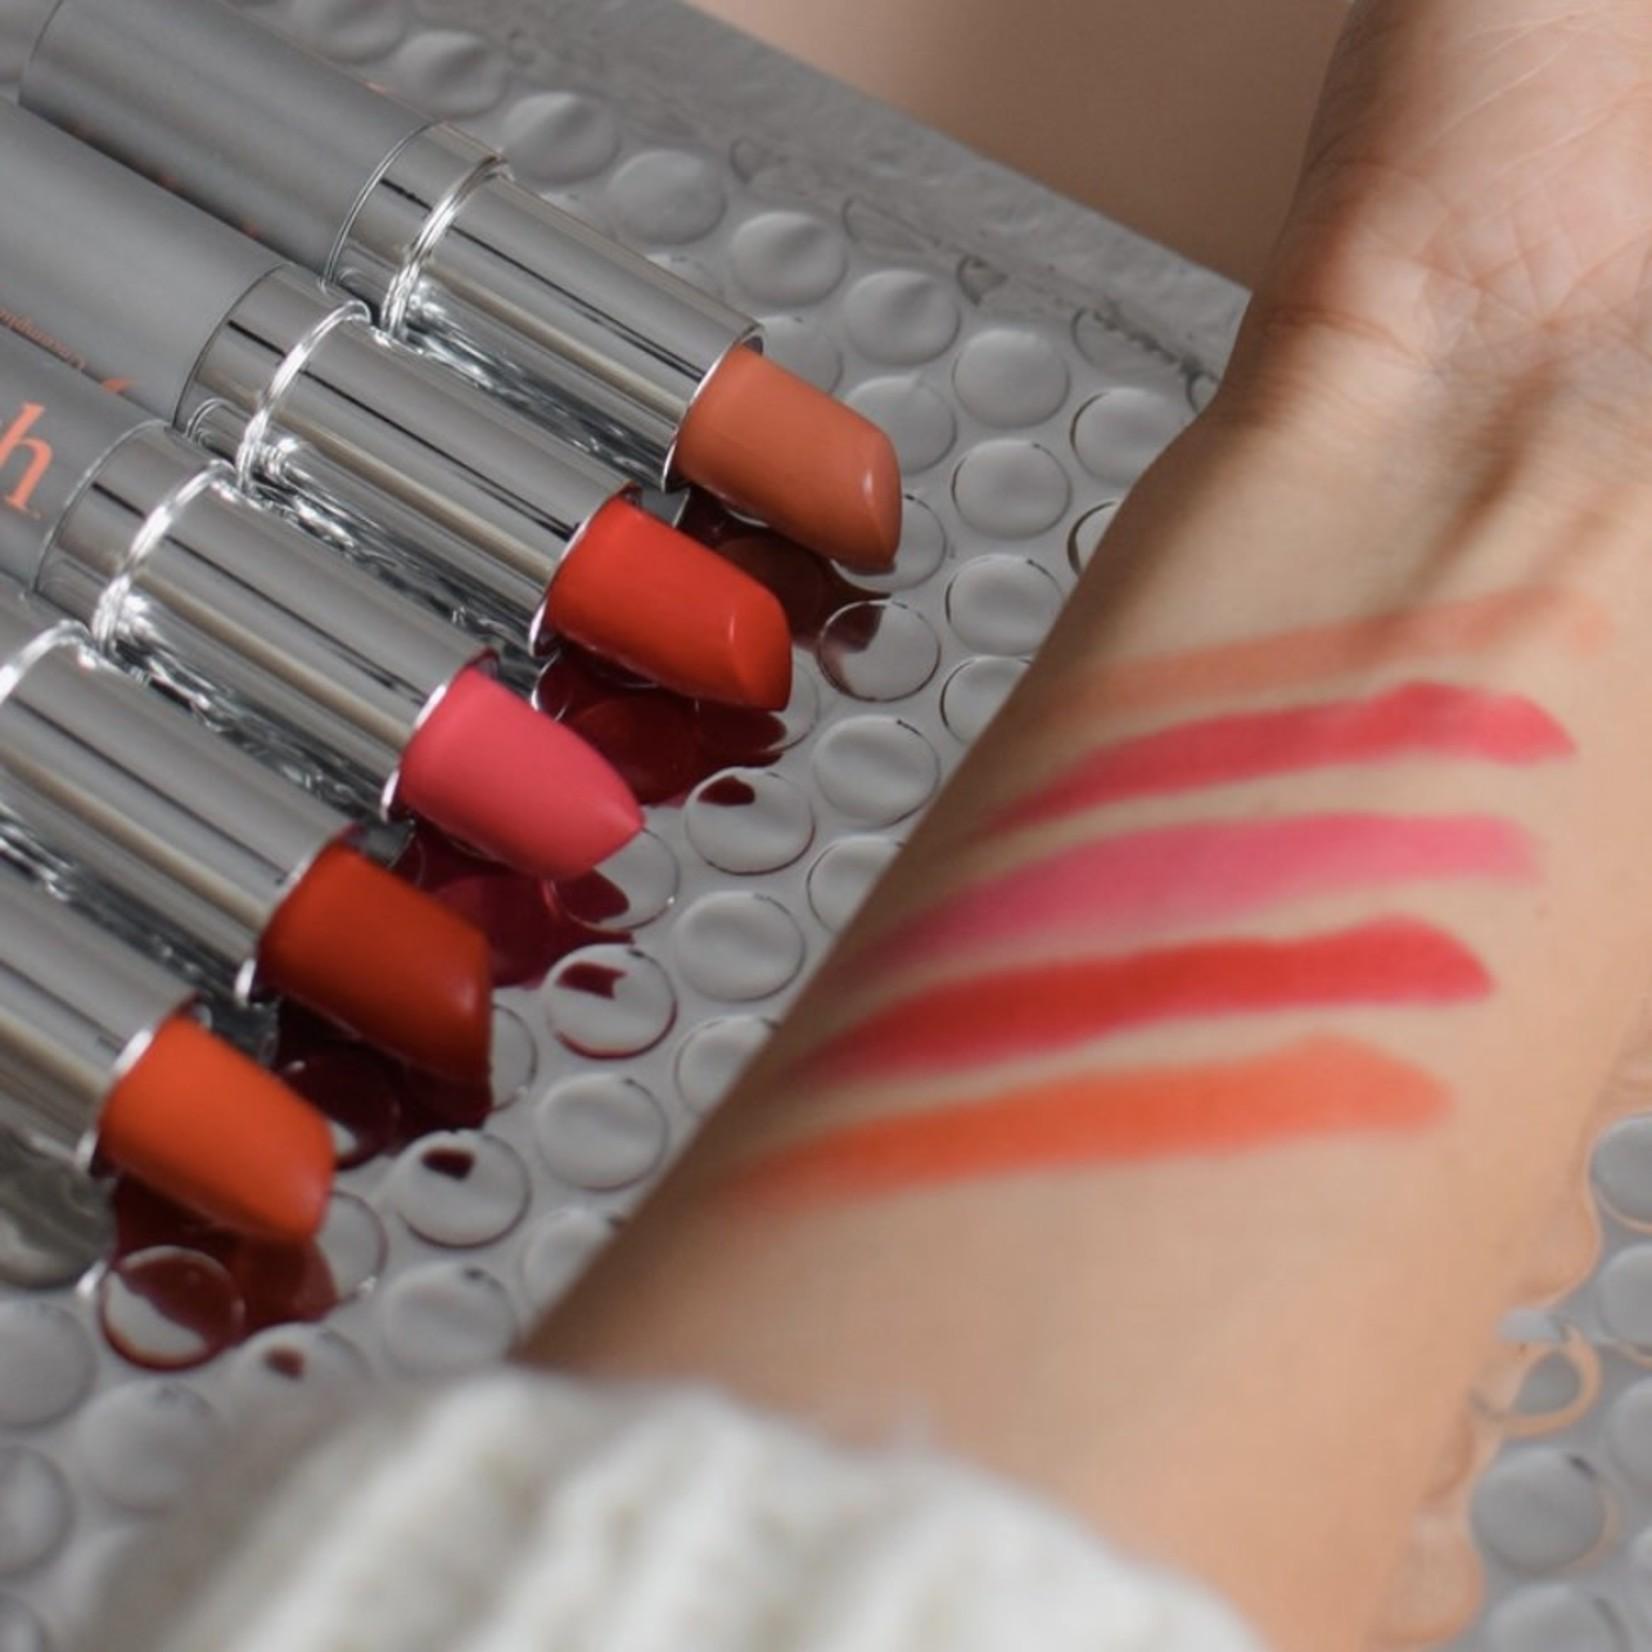 Dalish Dalish Lipstick - L02 Fuchsia